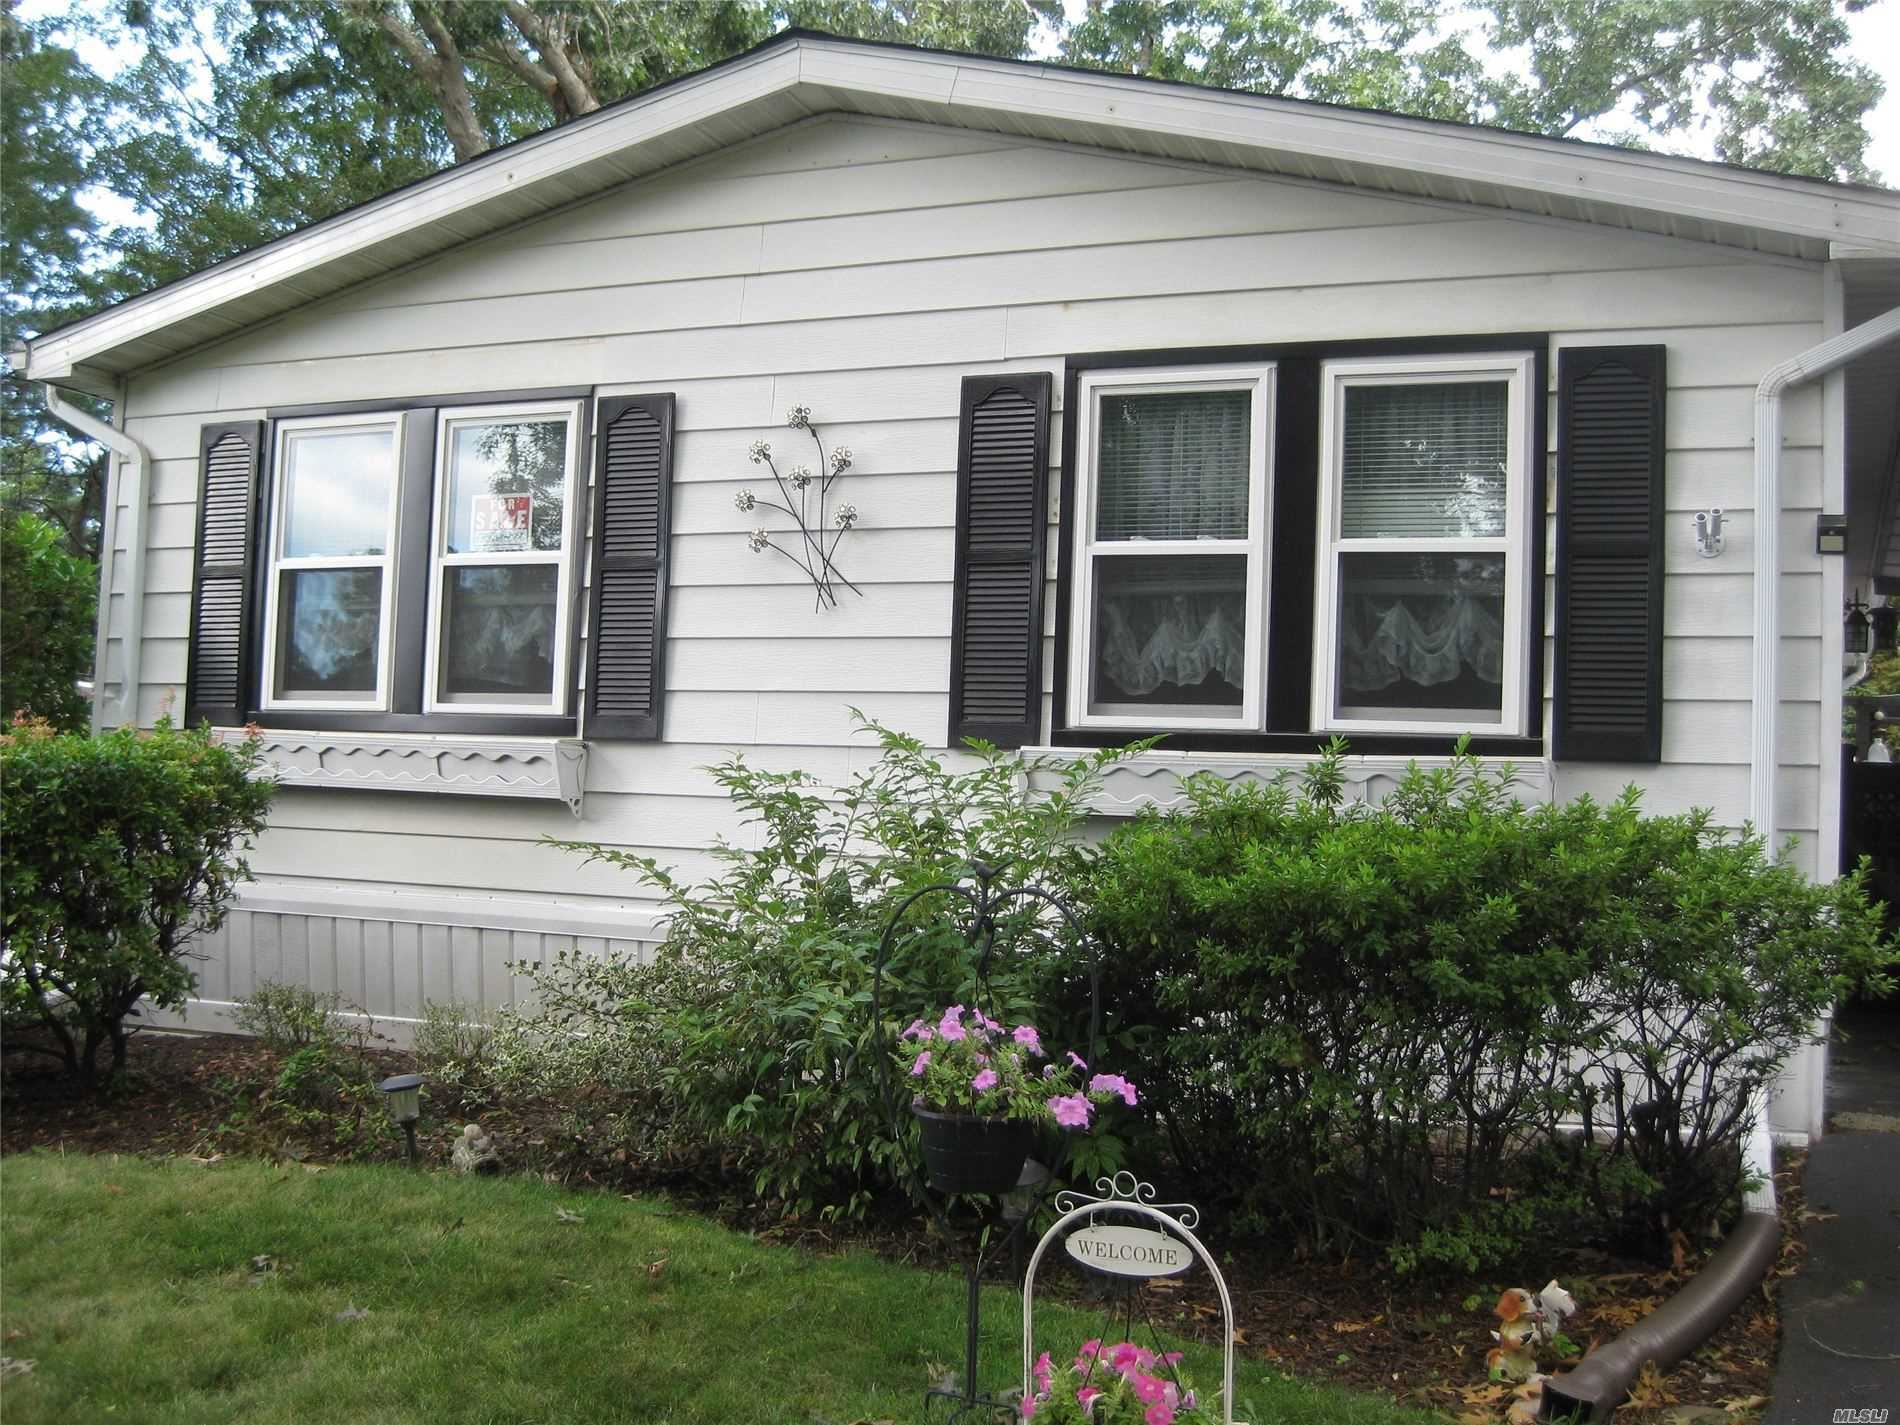 525-171 Riverleigh Avenue, Riverhead, NY 11901 - MLS#: 3241024